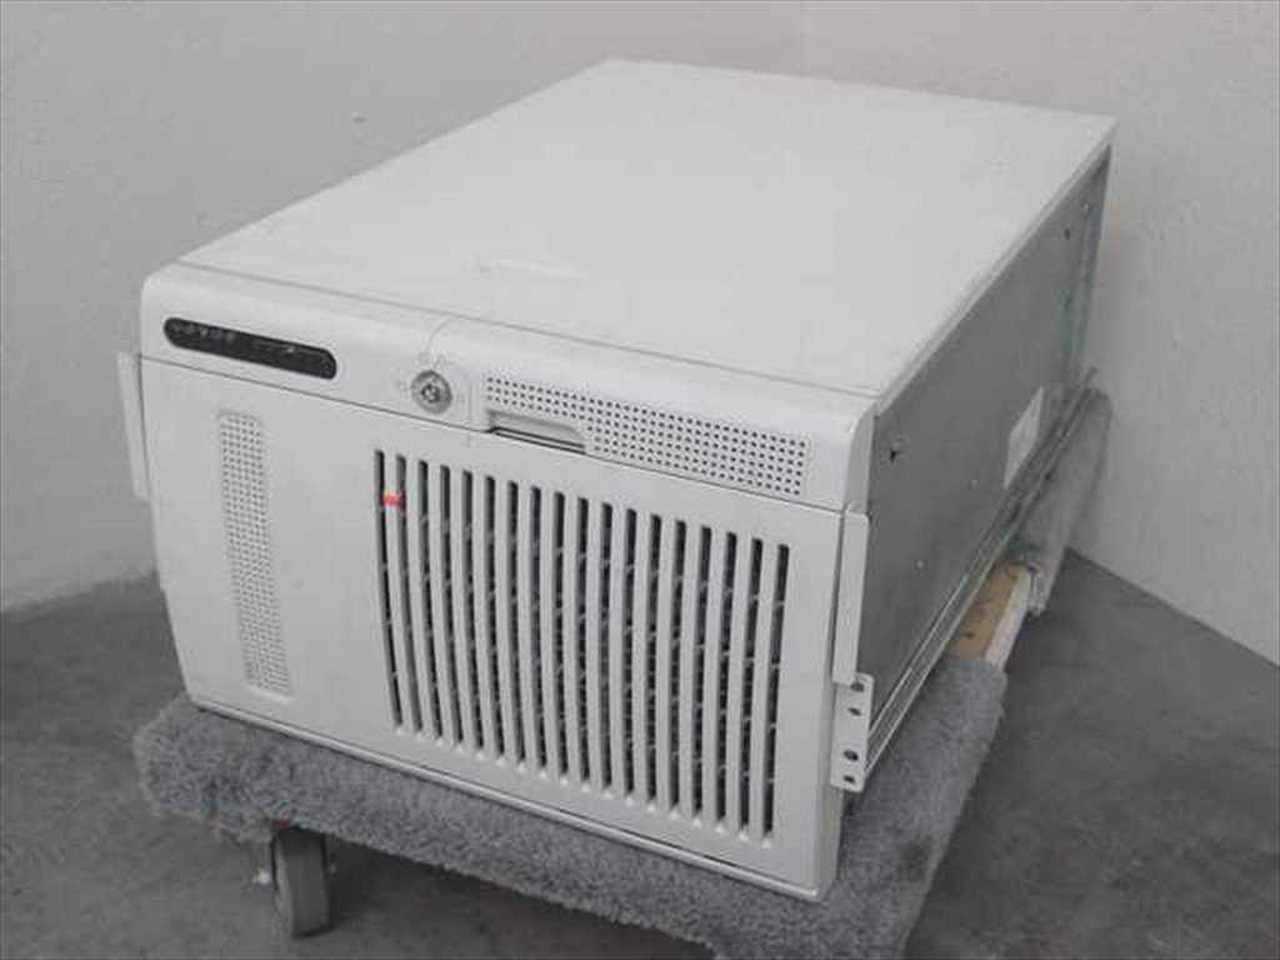 intel-skcb000np0ch-sc450nx-server-platfo